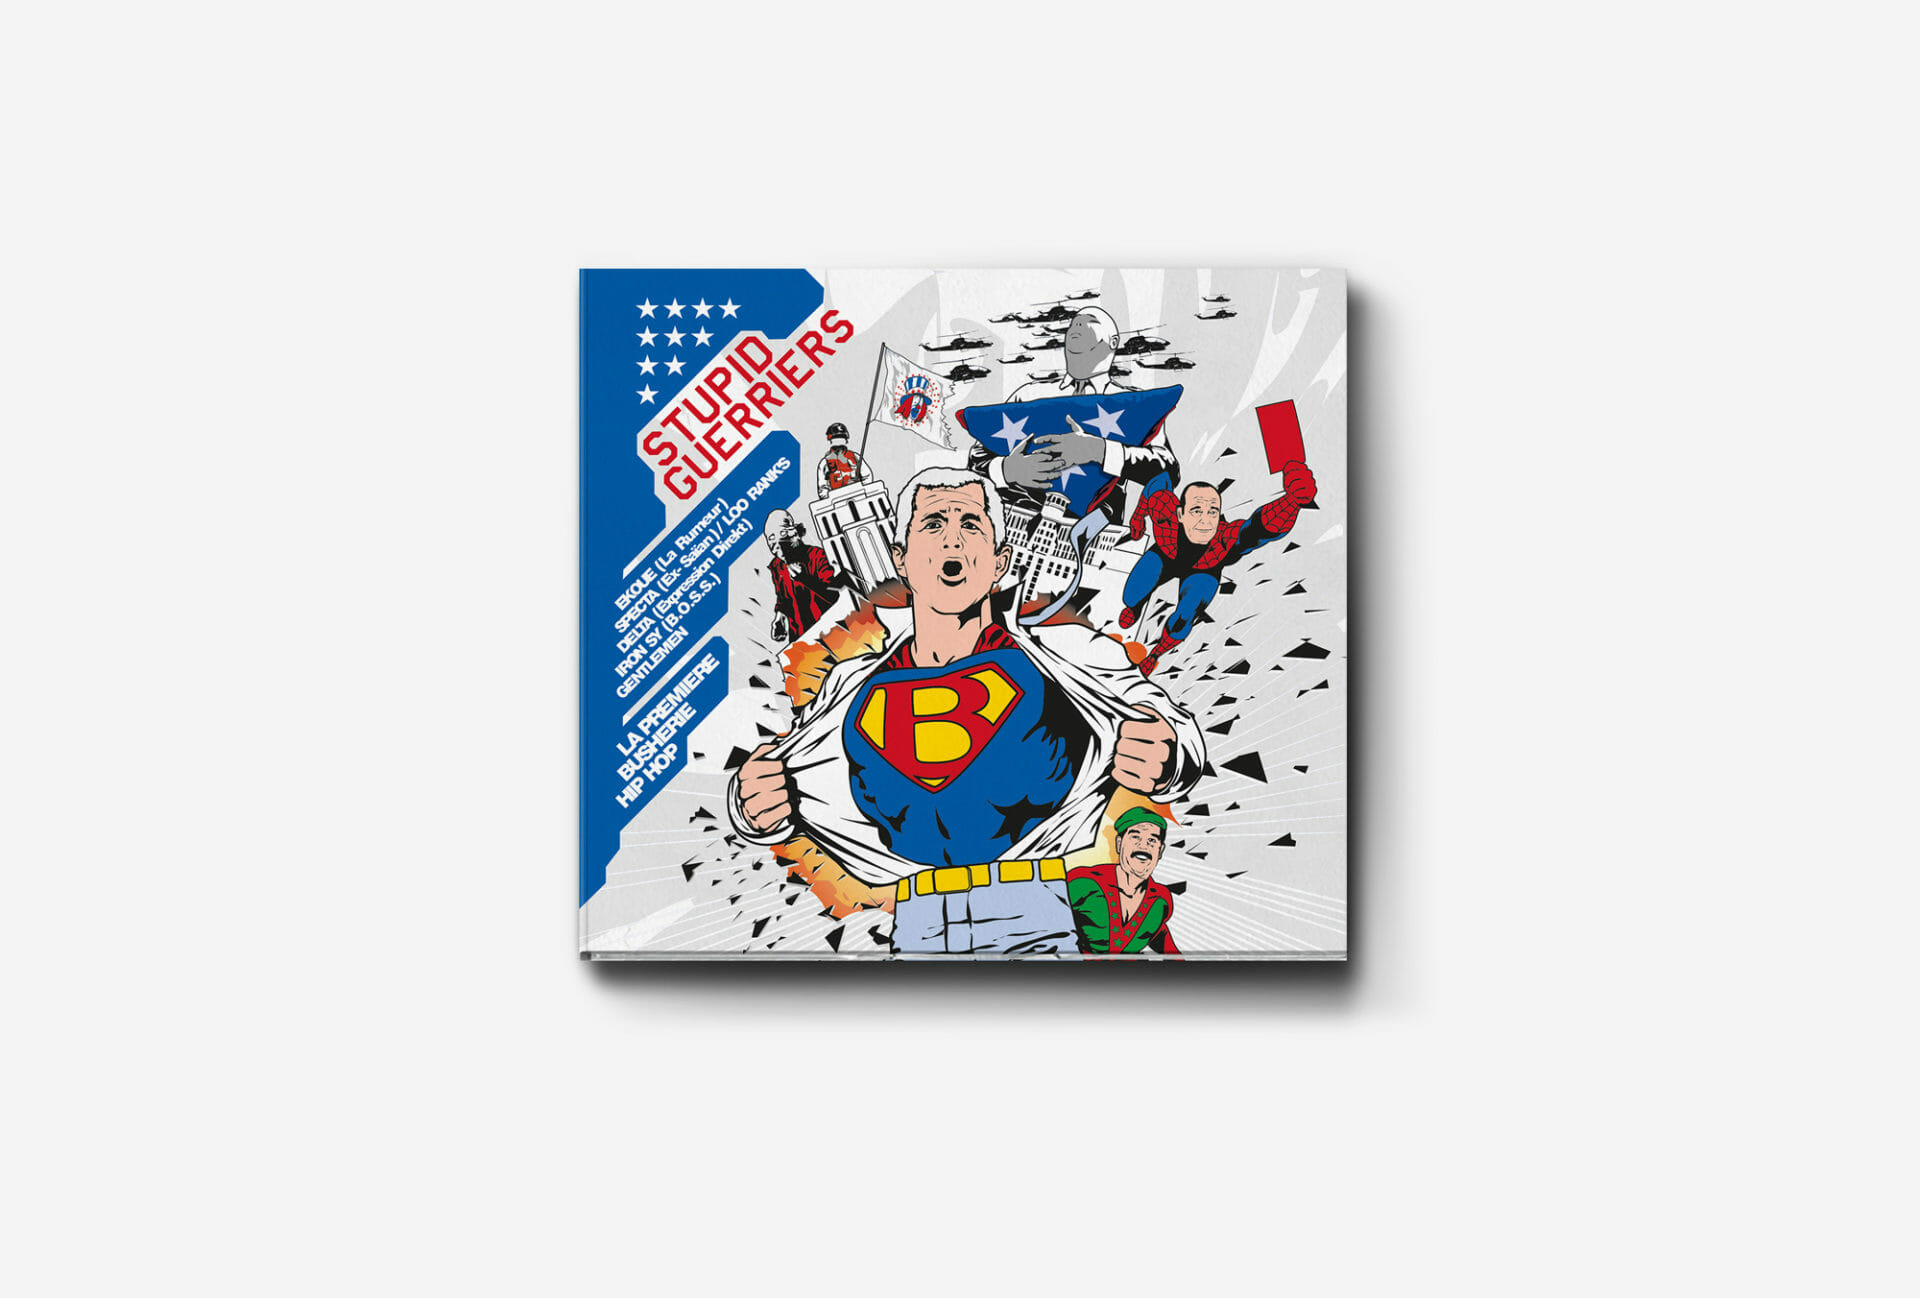 StupidGuerrier-book-cd-01